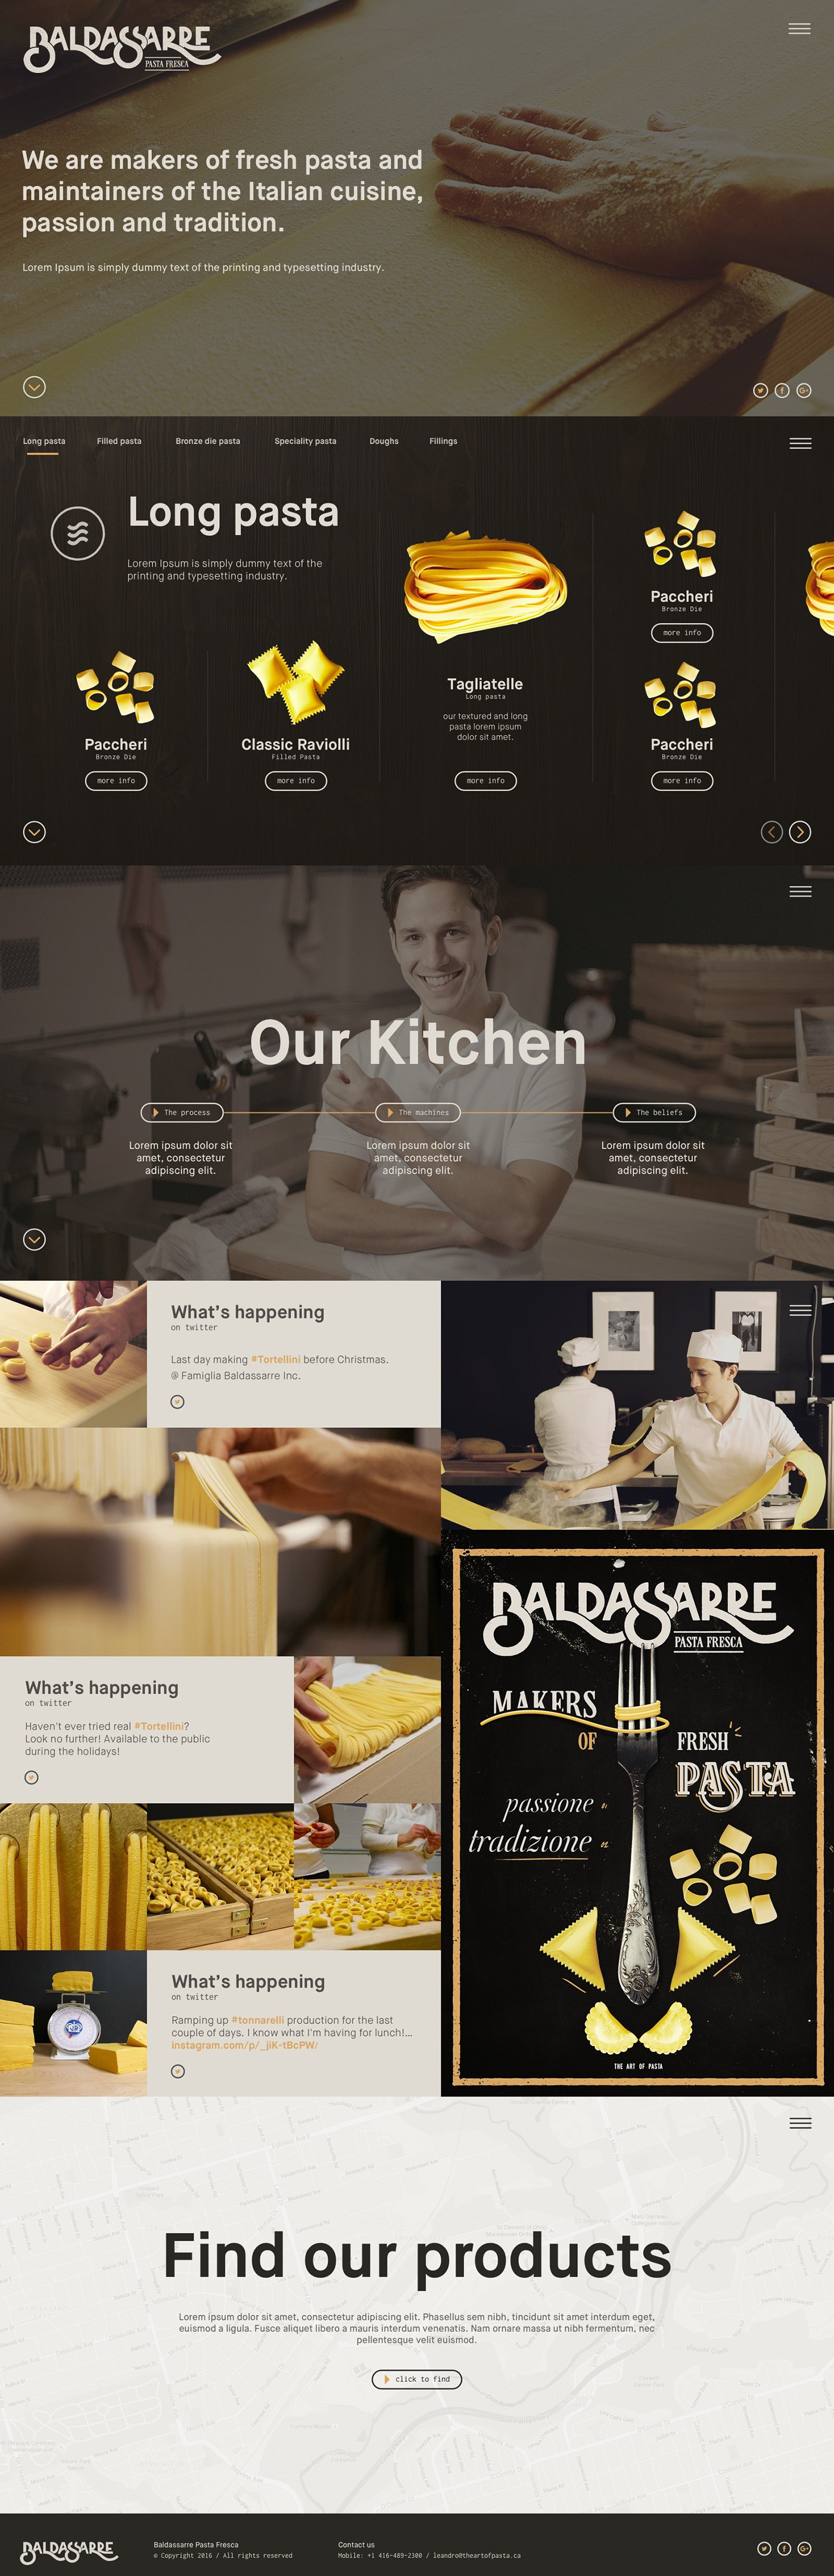 Pasta Food  logo identity visualid  baldassarre dinner lunch italian cuisine